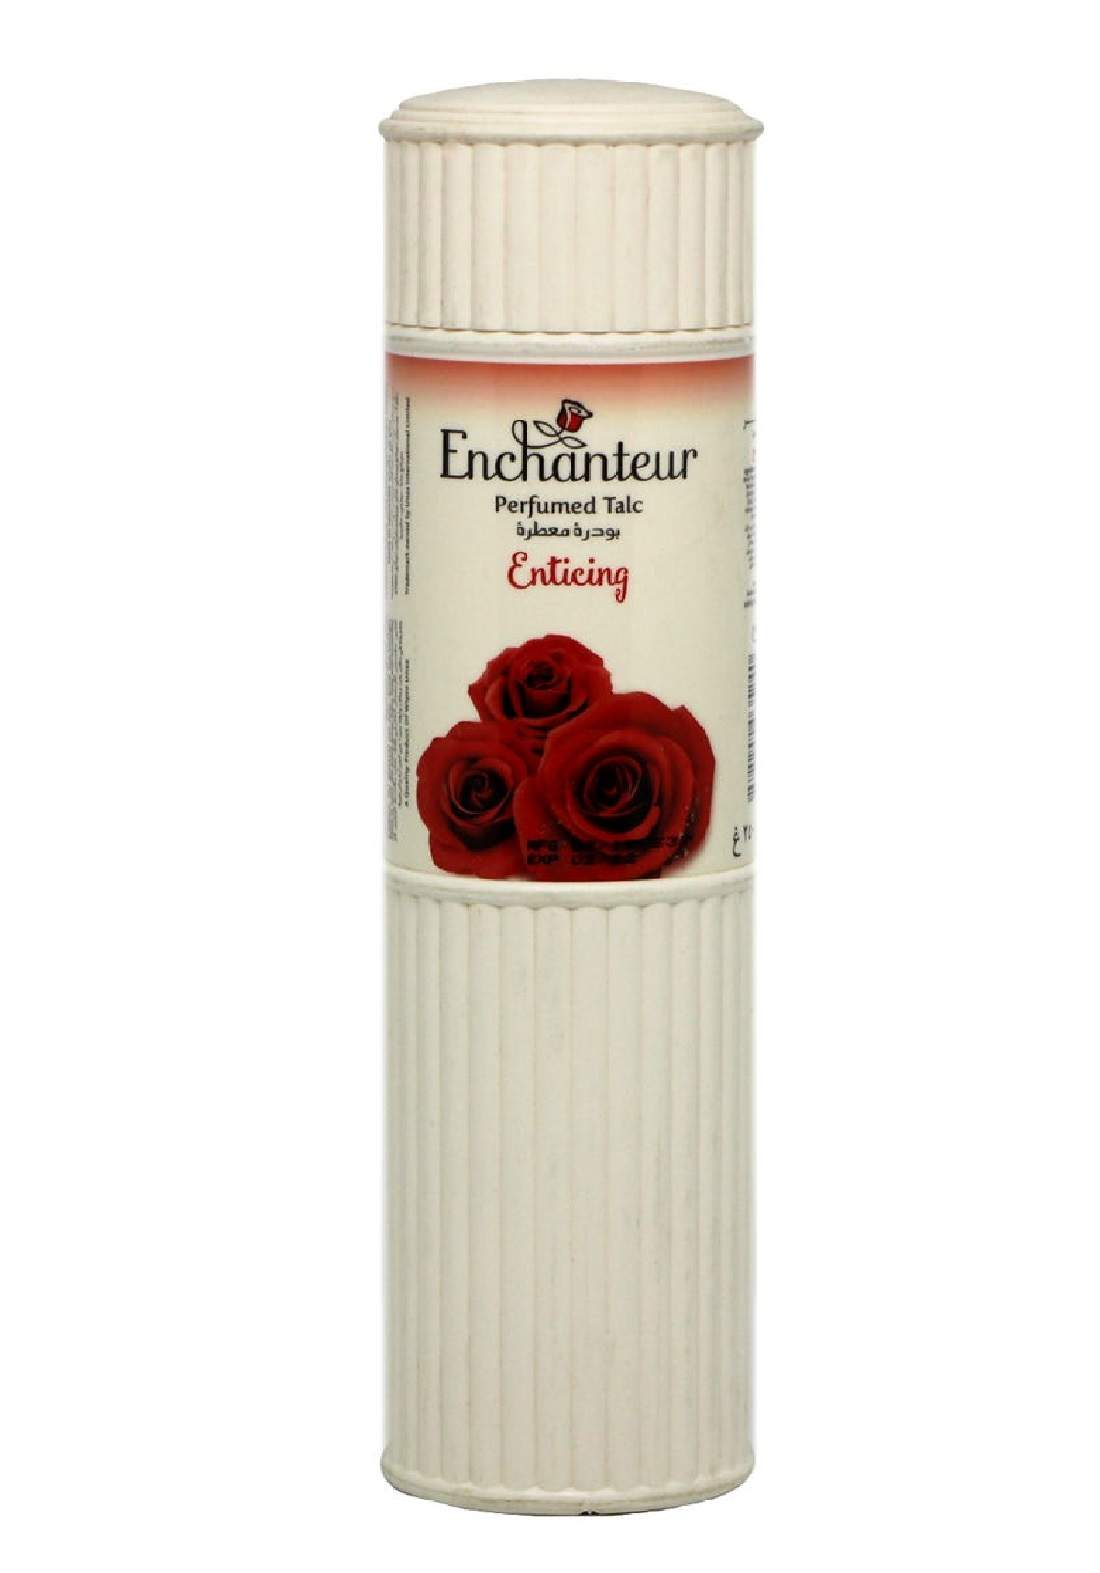 Enchanteur Enticing Perfumed Talc 250g بودرة للجسم